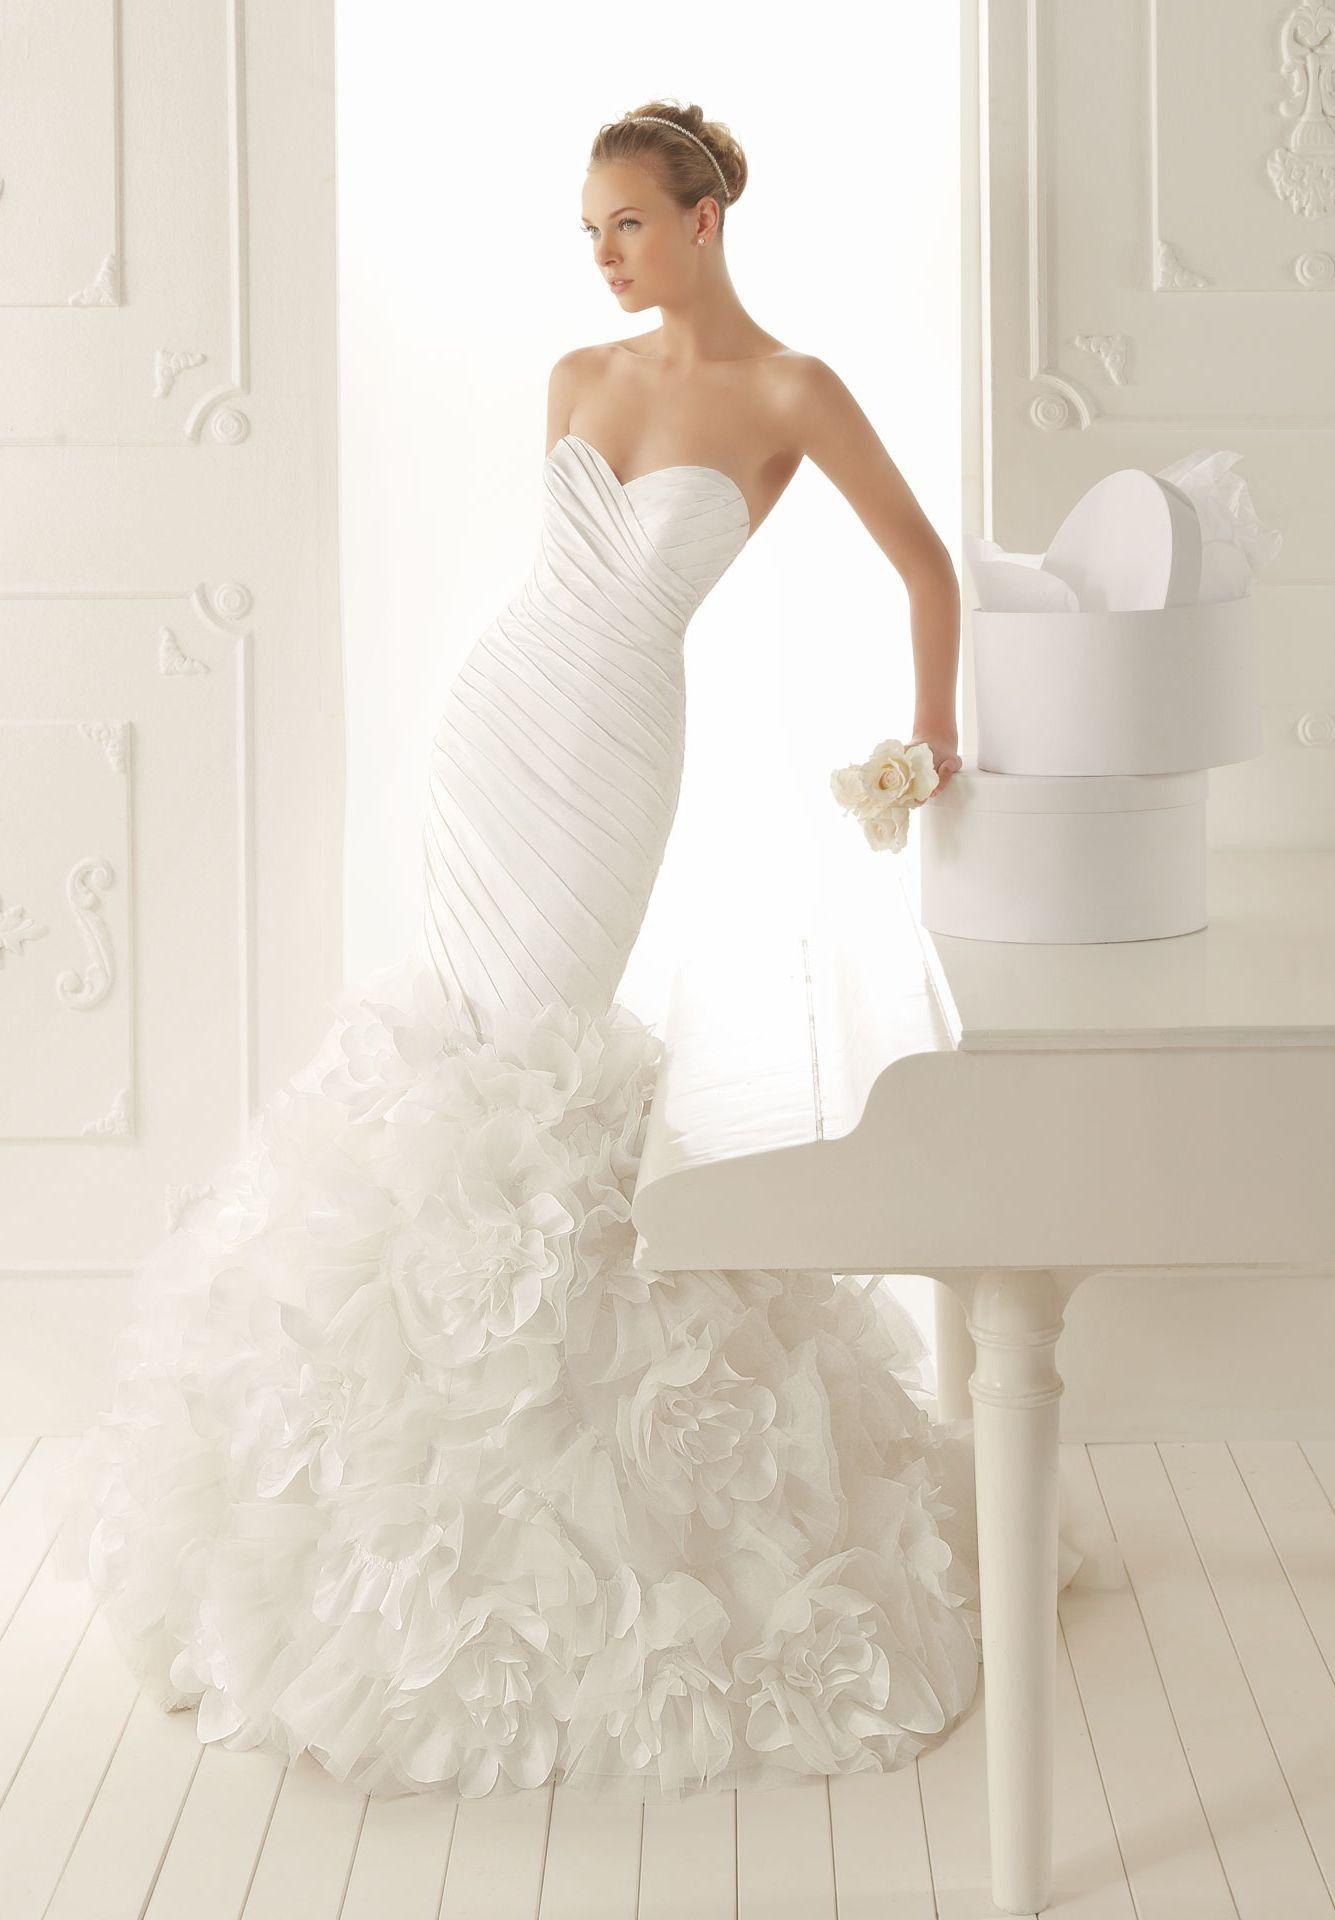 Mermaid ruffle wedding dress  Satin Sweetheart Mermaid Elegant Elegant Dress  Bride  WHITEAZALEA